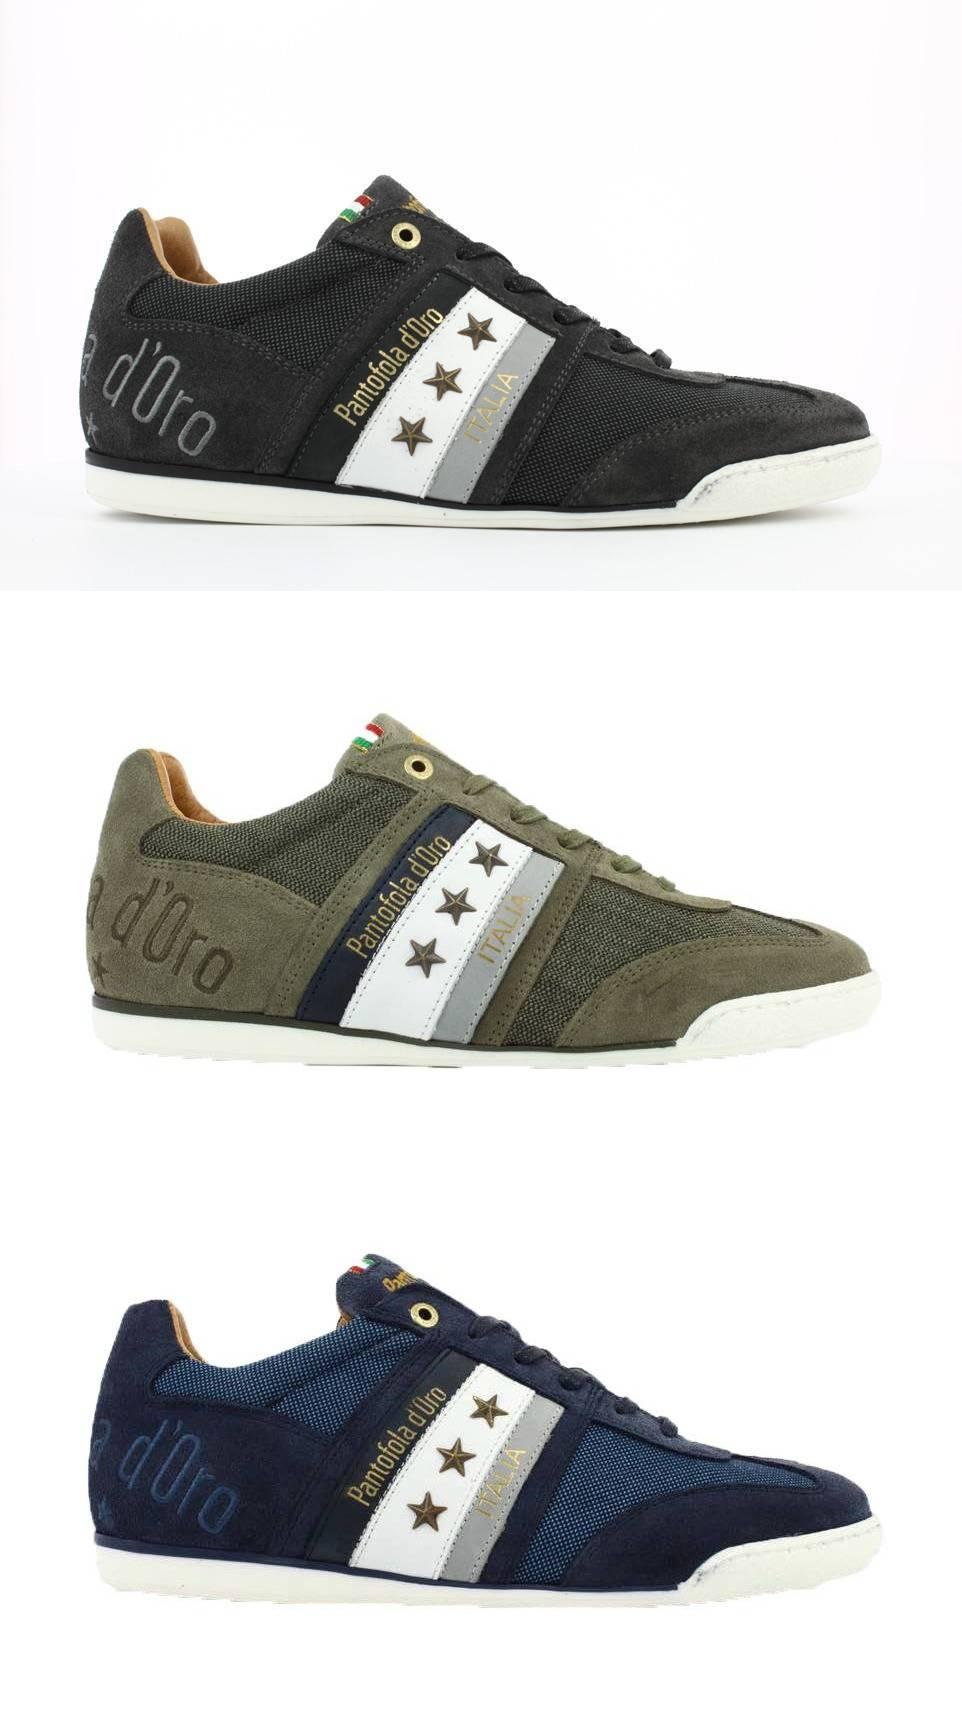 PANTOFOLA D'ORO Imola Canvas Uomo Low Low-Cut Sneaker Halbschuhe Leder Schuhe